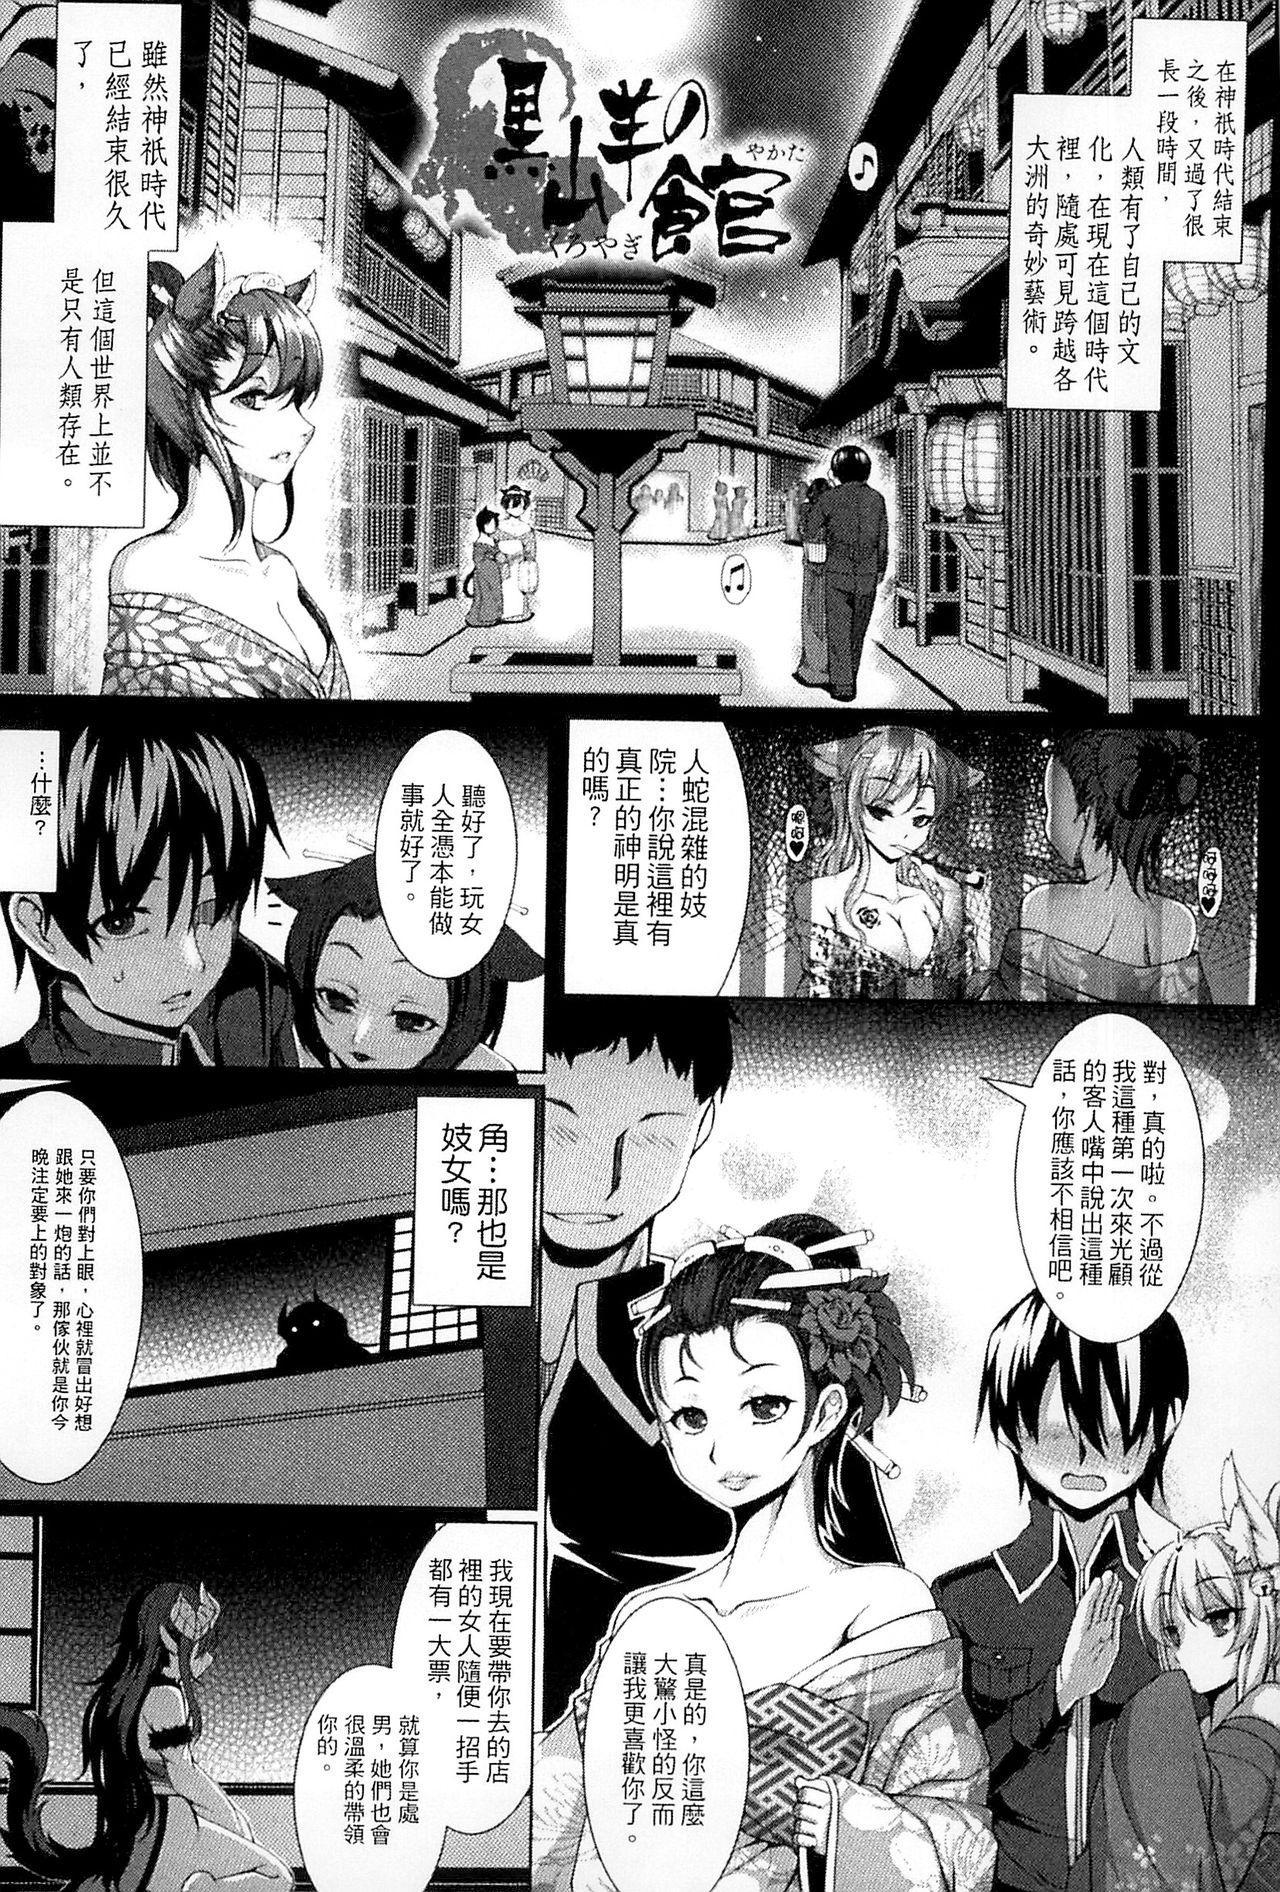 [Takayuki Hiyori] Aiyoku Gensou no Kai ~Cthulhu Pregnant~   愛欲幻想之怪 -克蘇魯- [Chinese] 19